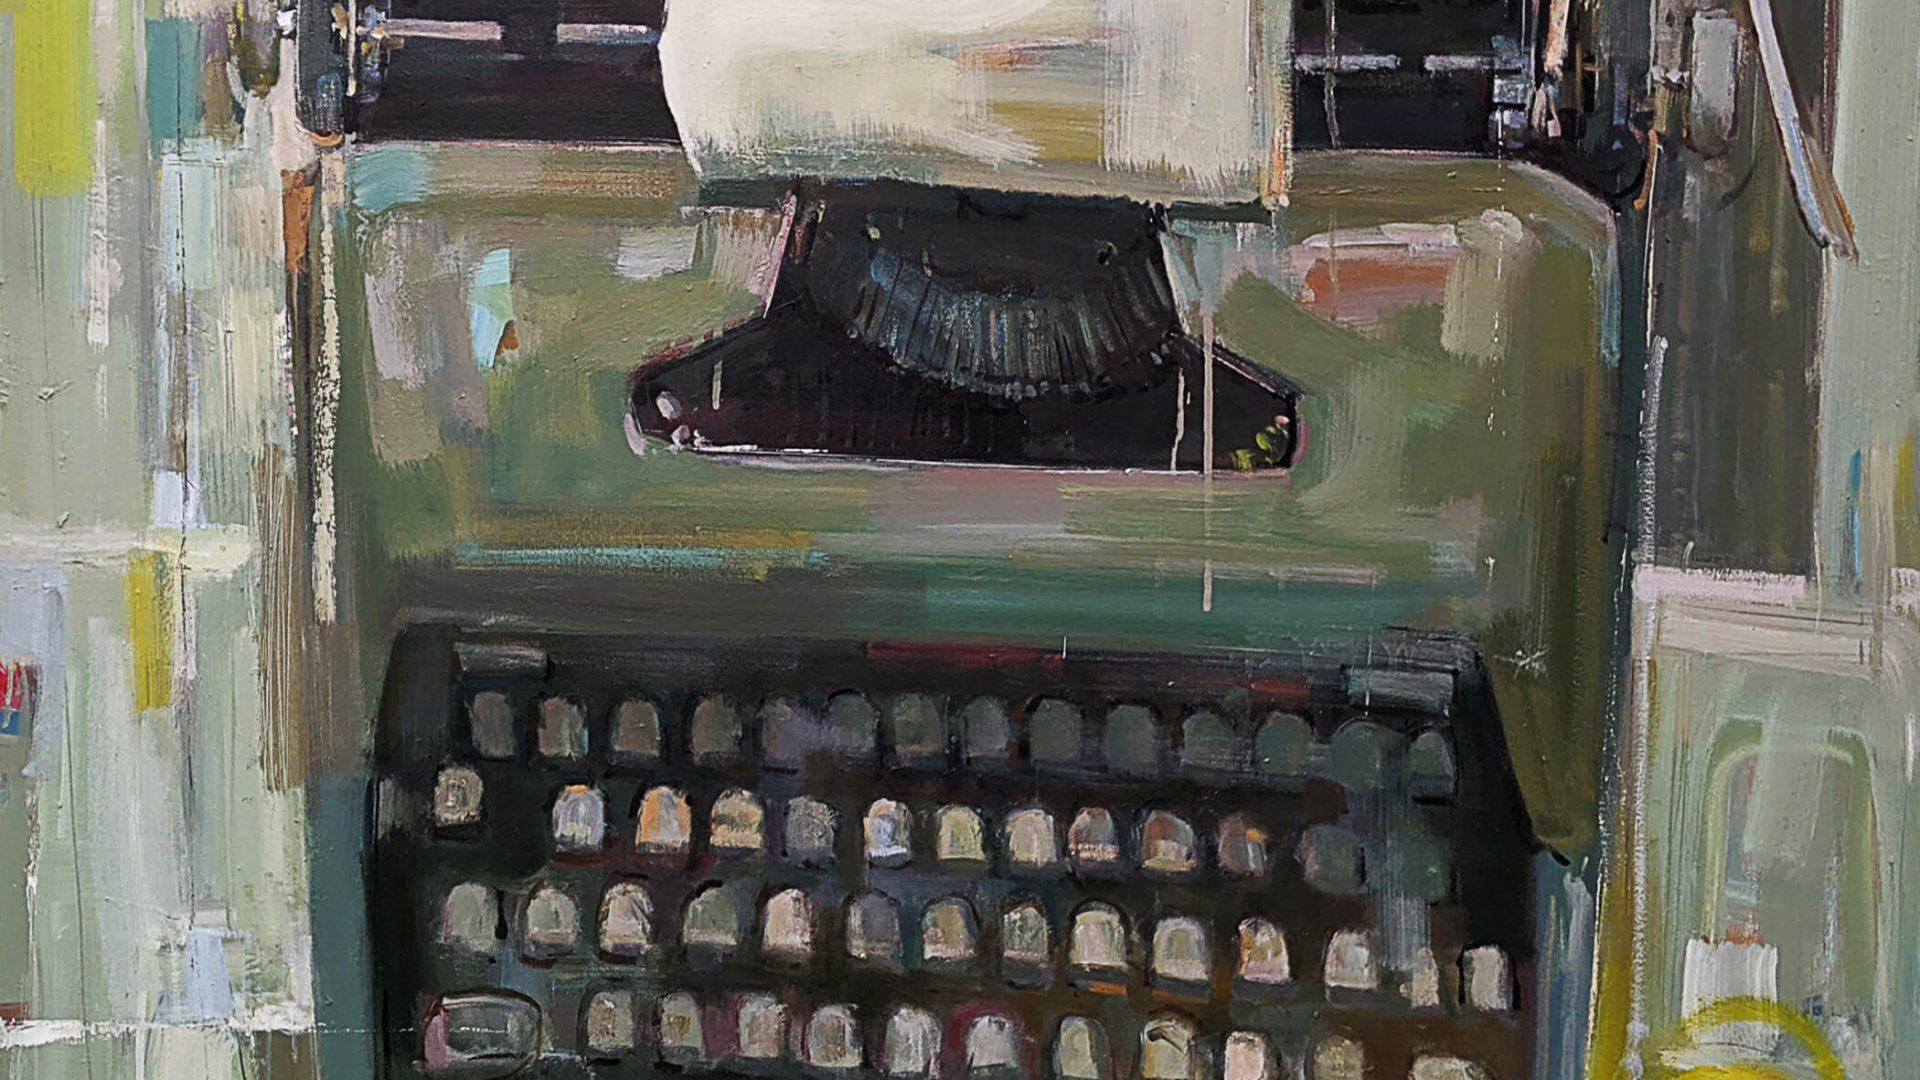 Painting of a typewriter